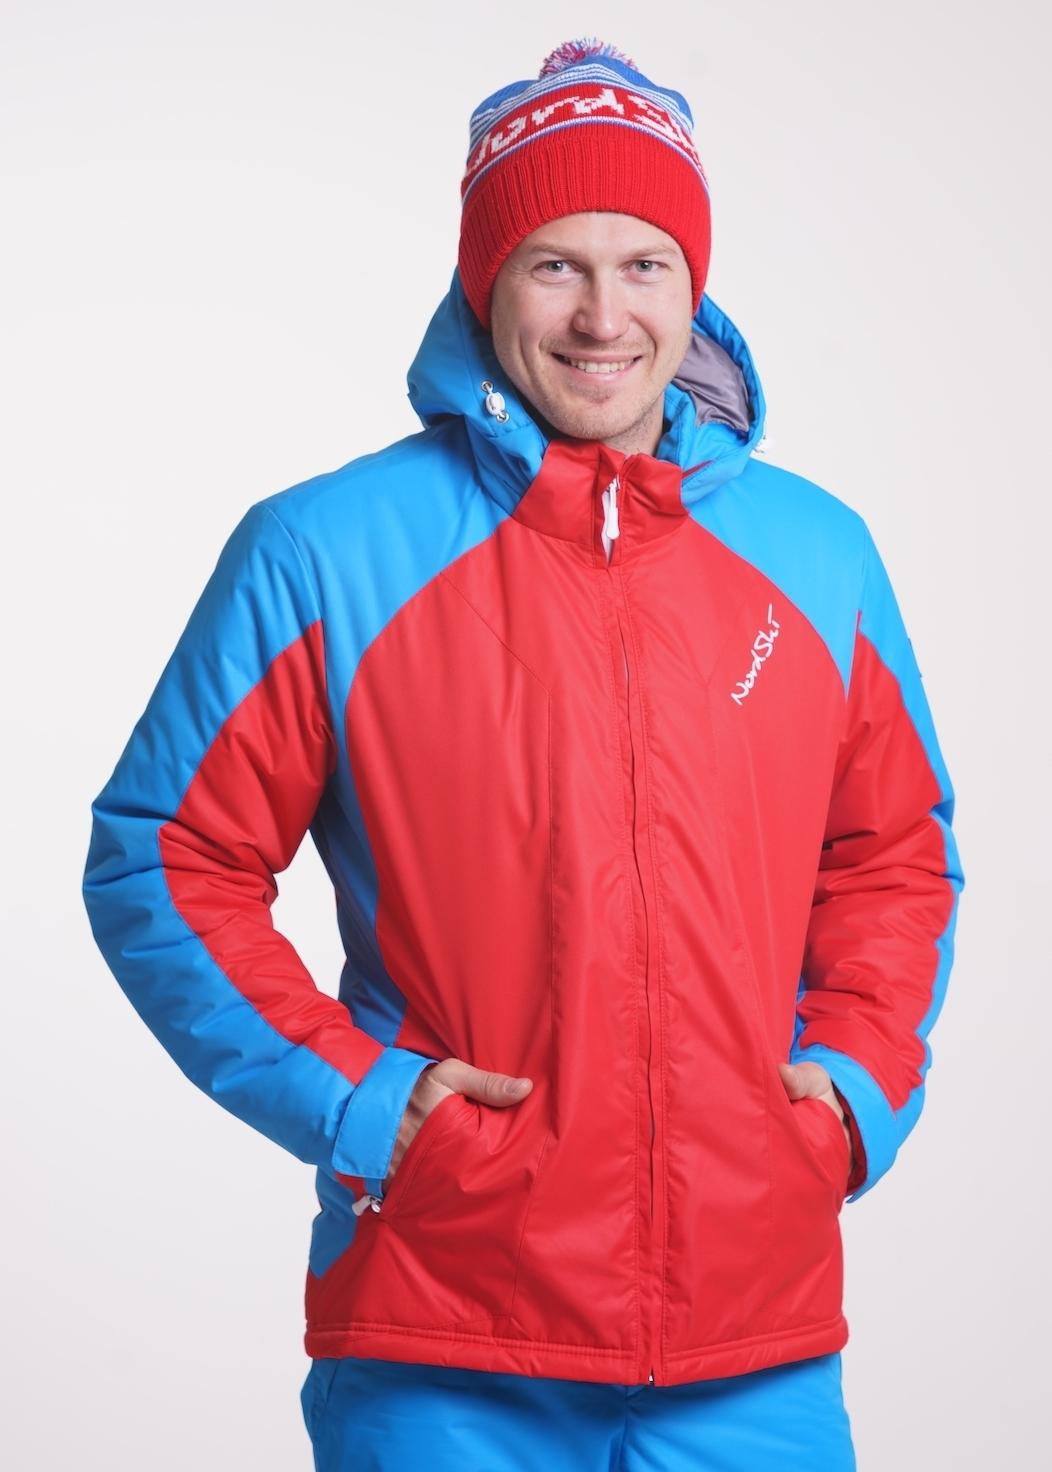 676f733e41f67 Детский Утеплённый прогулочный лыжный костюм Nordski National Red ...